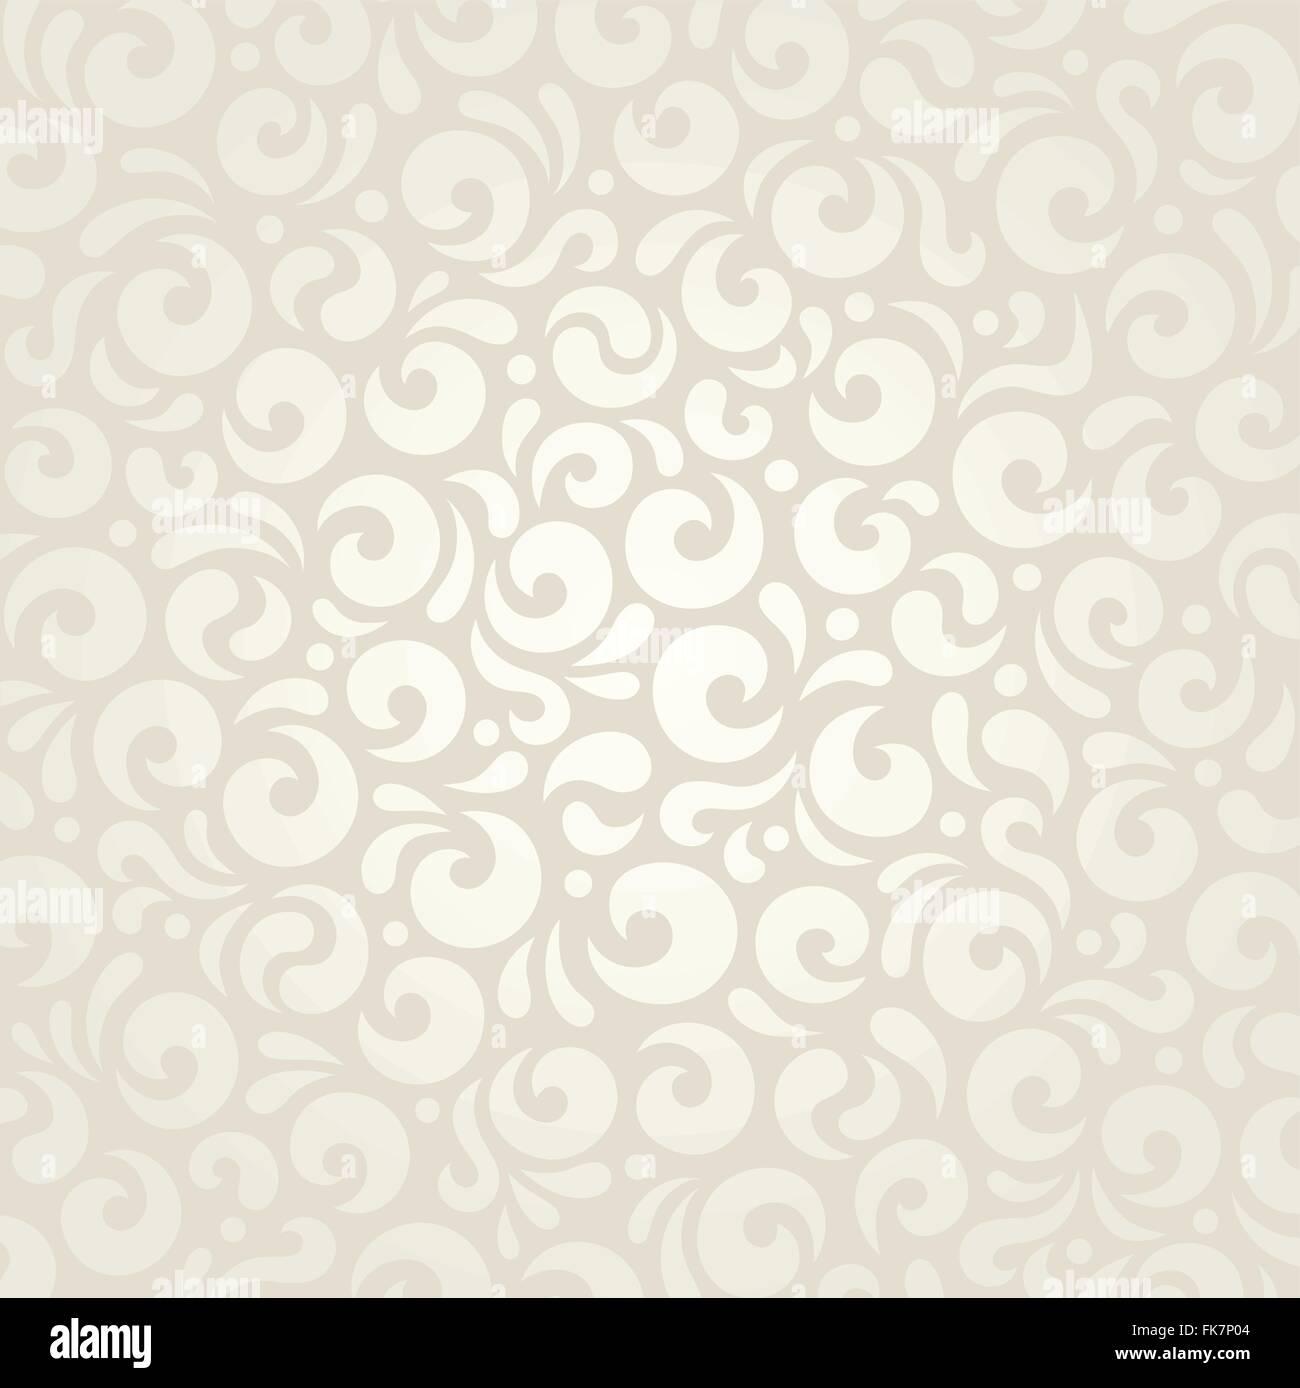 Wedding Retro Pale Wallpaper Decorative Pattern Design Stock Vector